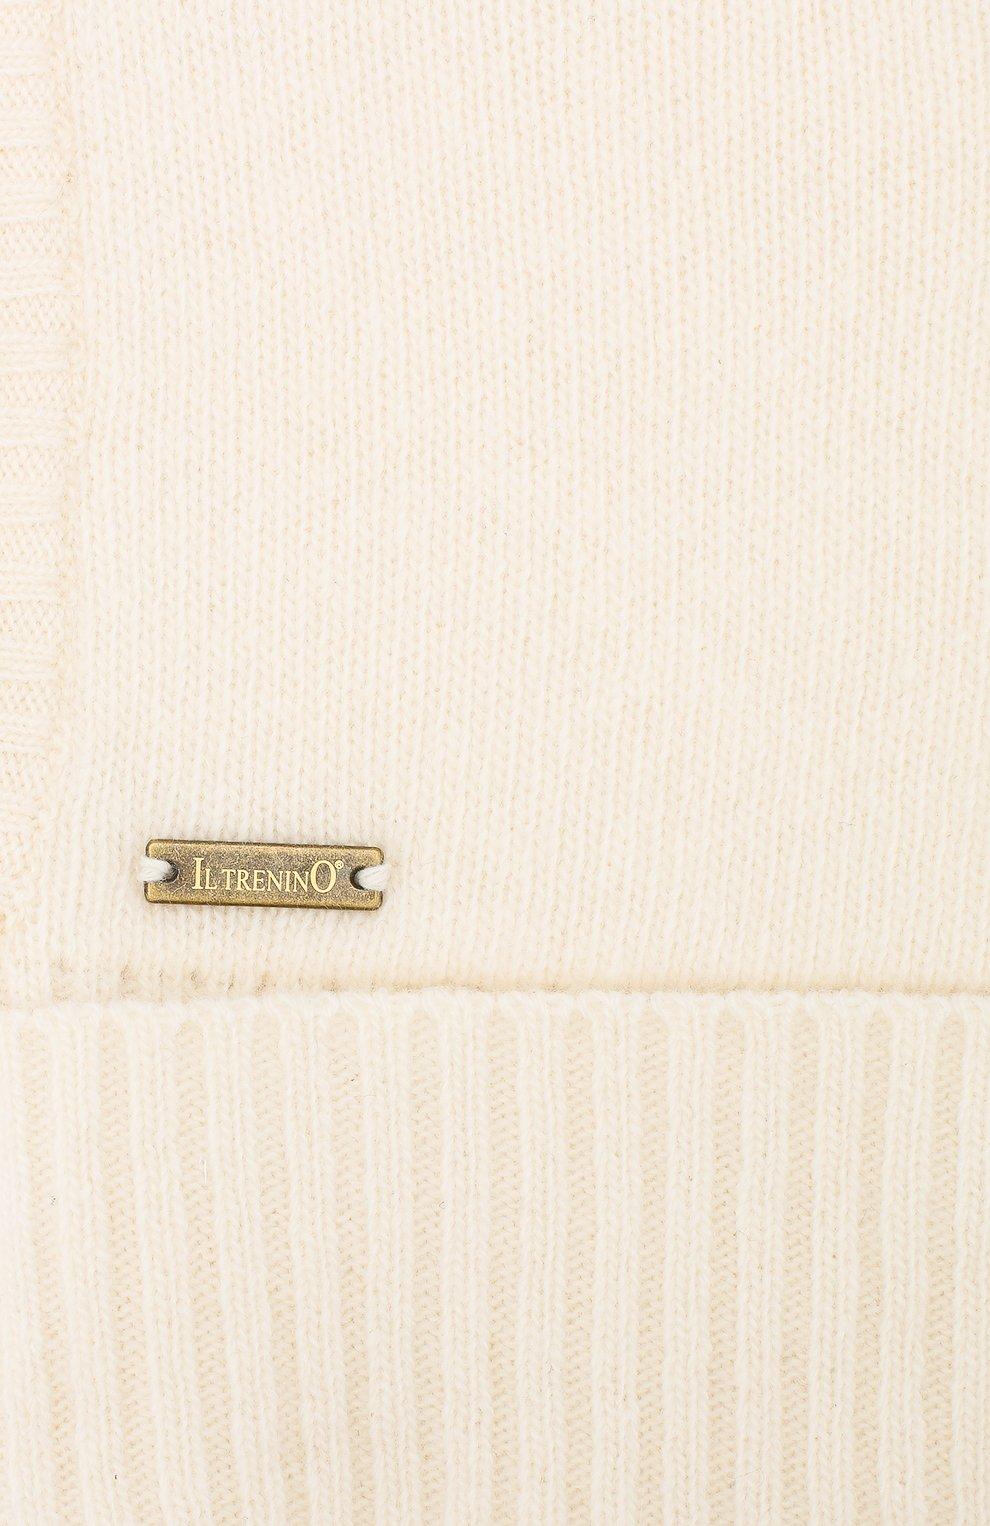 Детского шапка-балаклава из шерсти и кашемира IL TRENINO белого цвета, арт. 18 7529/E0 | Фото 3